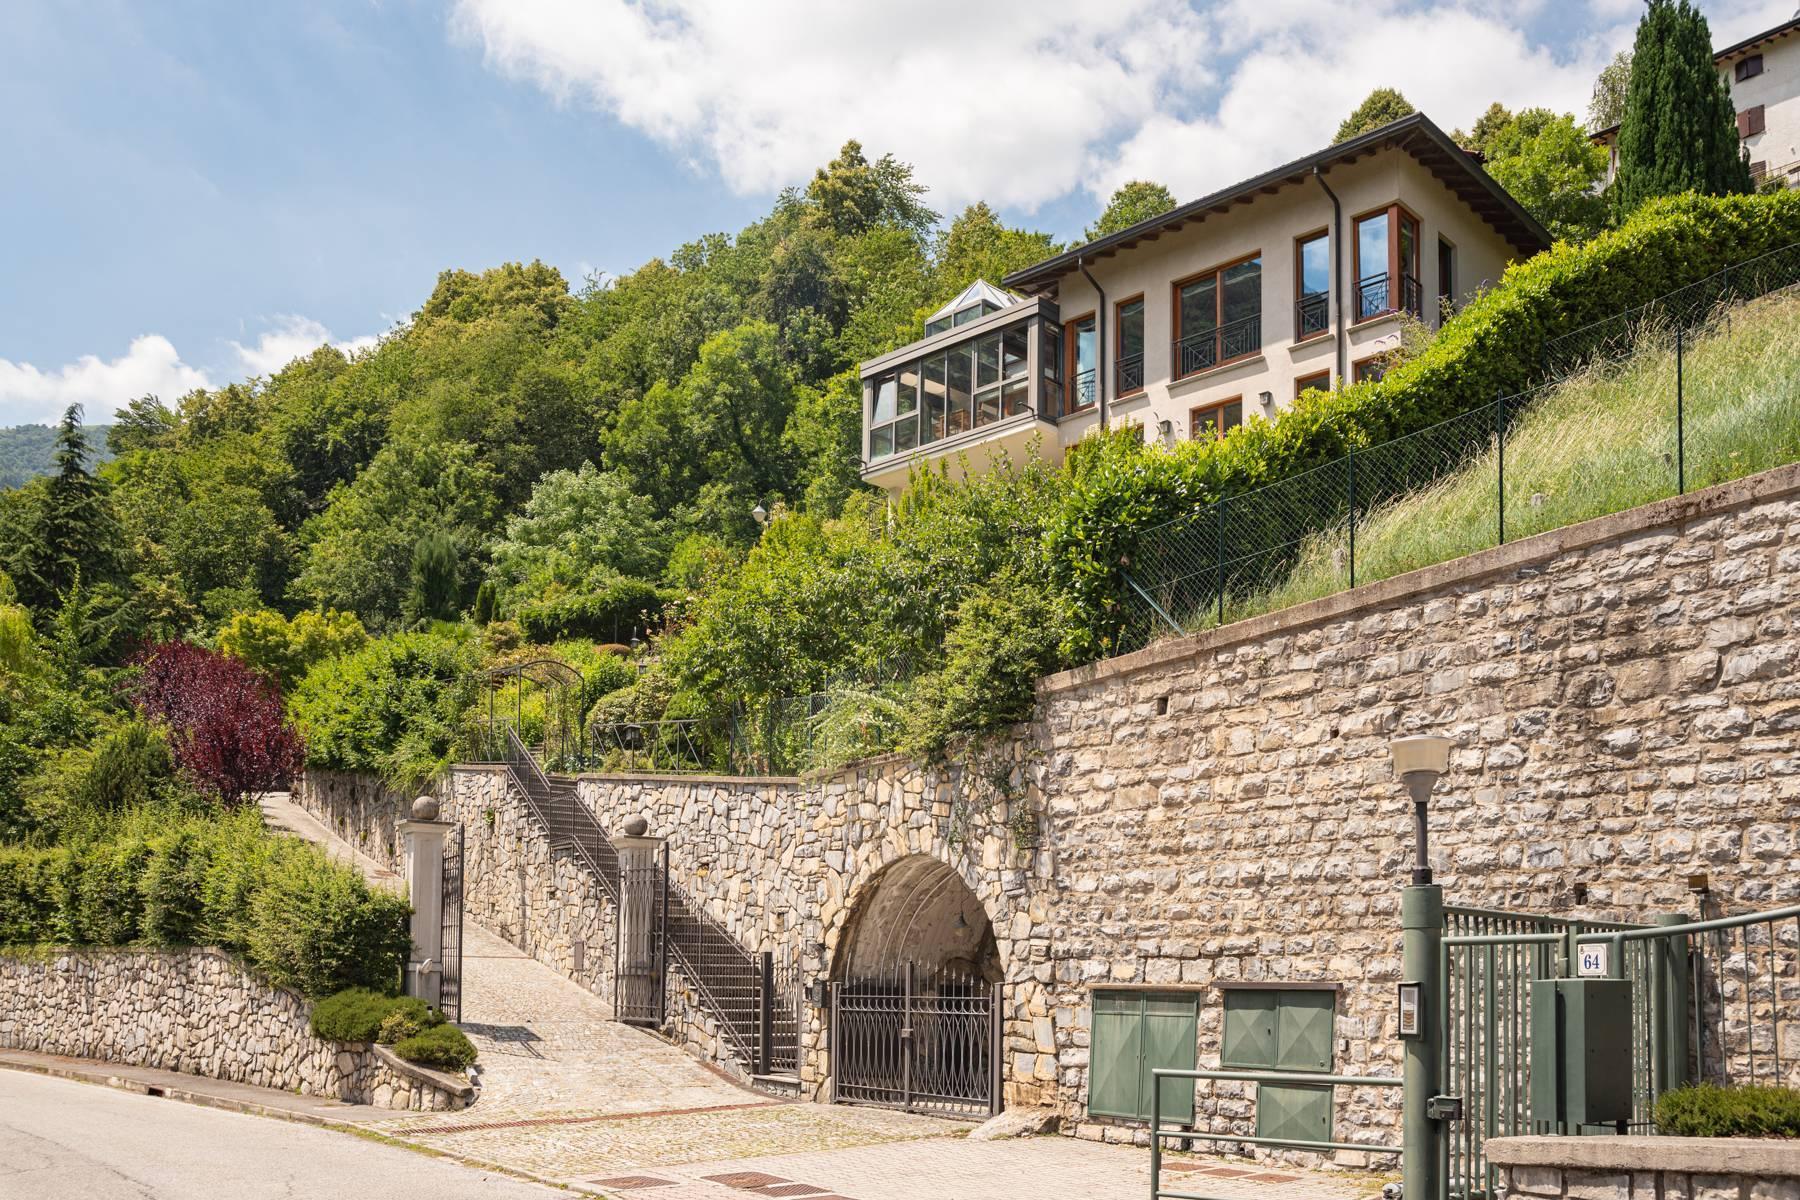 Splendida villa moderna sulla collina soleggiata sopra Argegno - 4